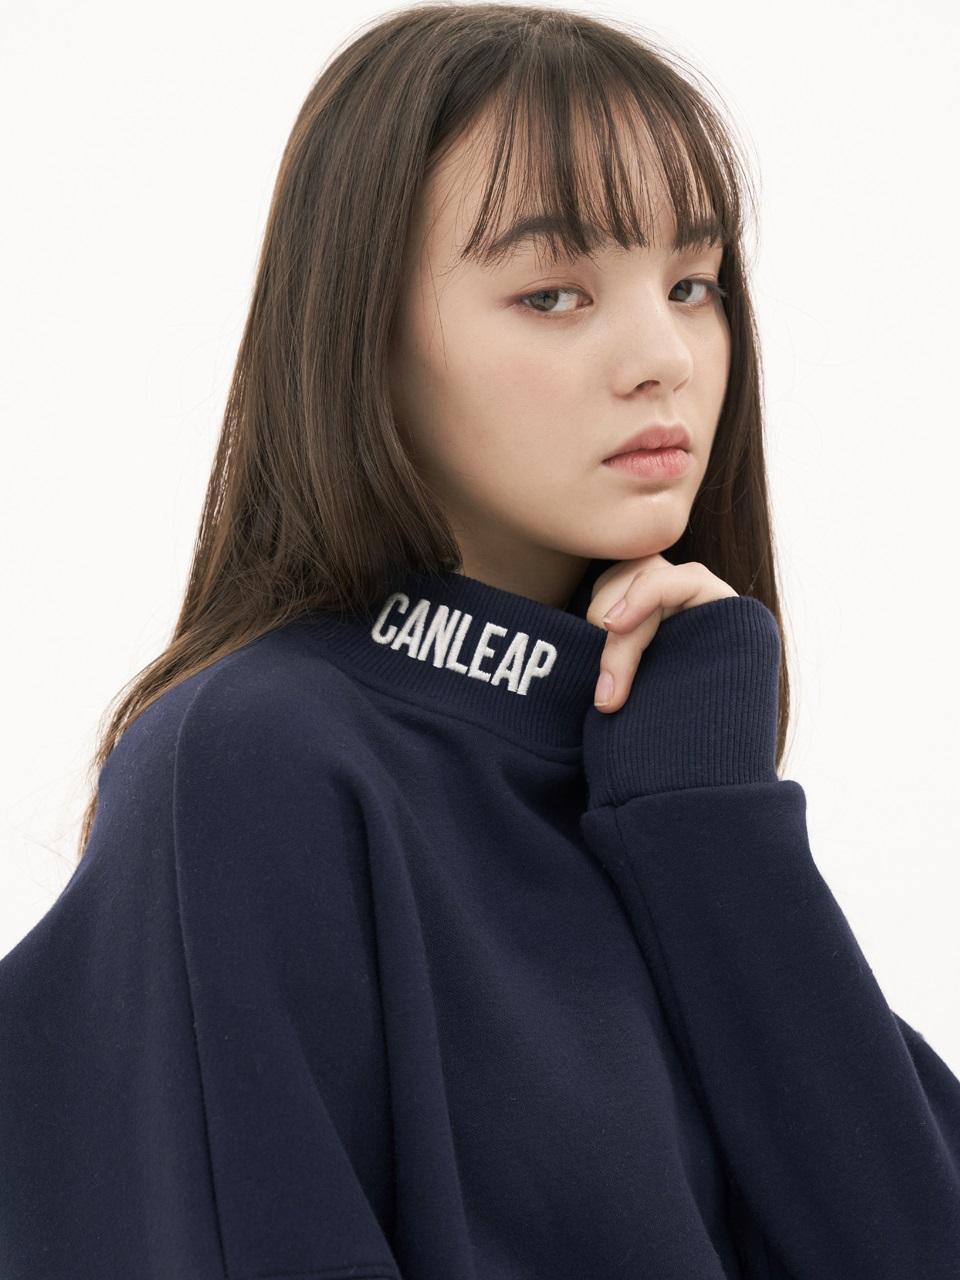 CANLEAP国际品牌品牌2020春夏宽松落肩LOGO字母刺绣高领女士拉绒卫衣_深灰色